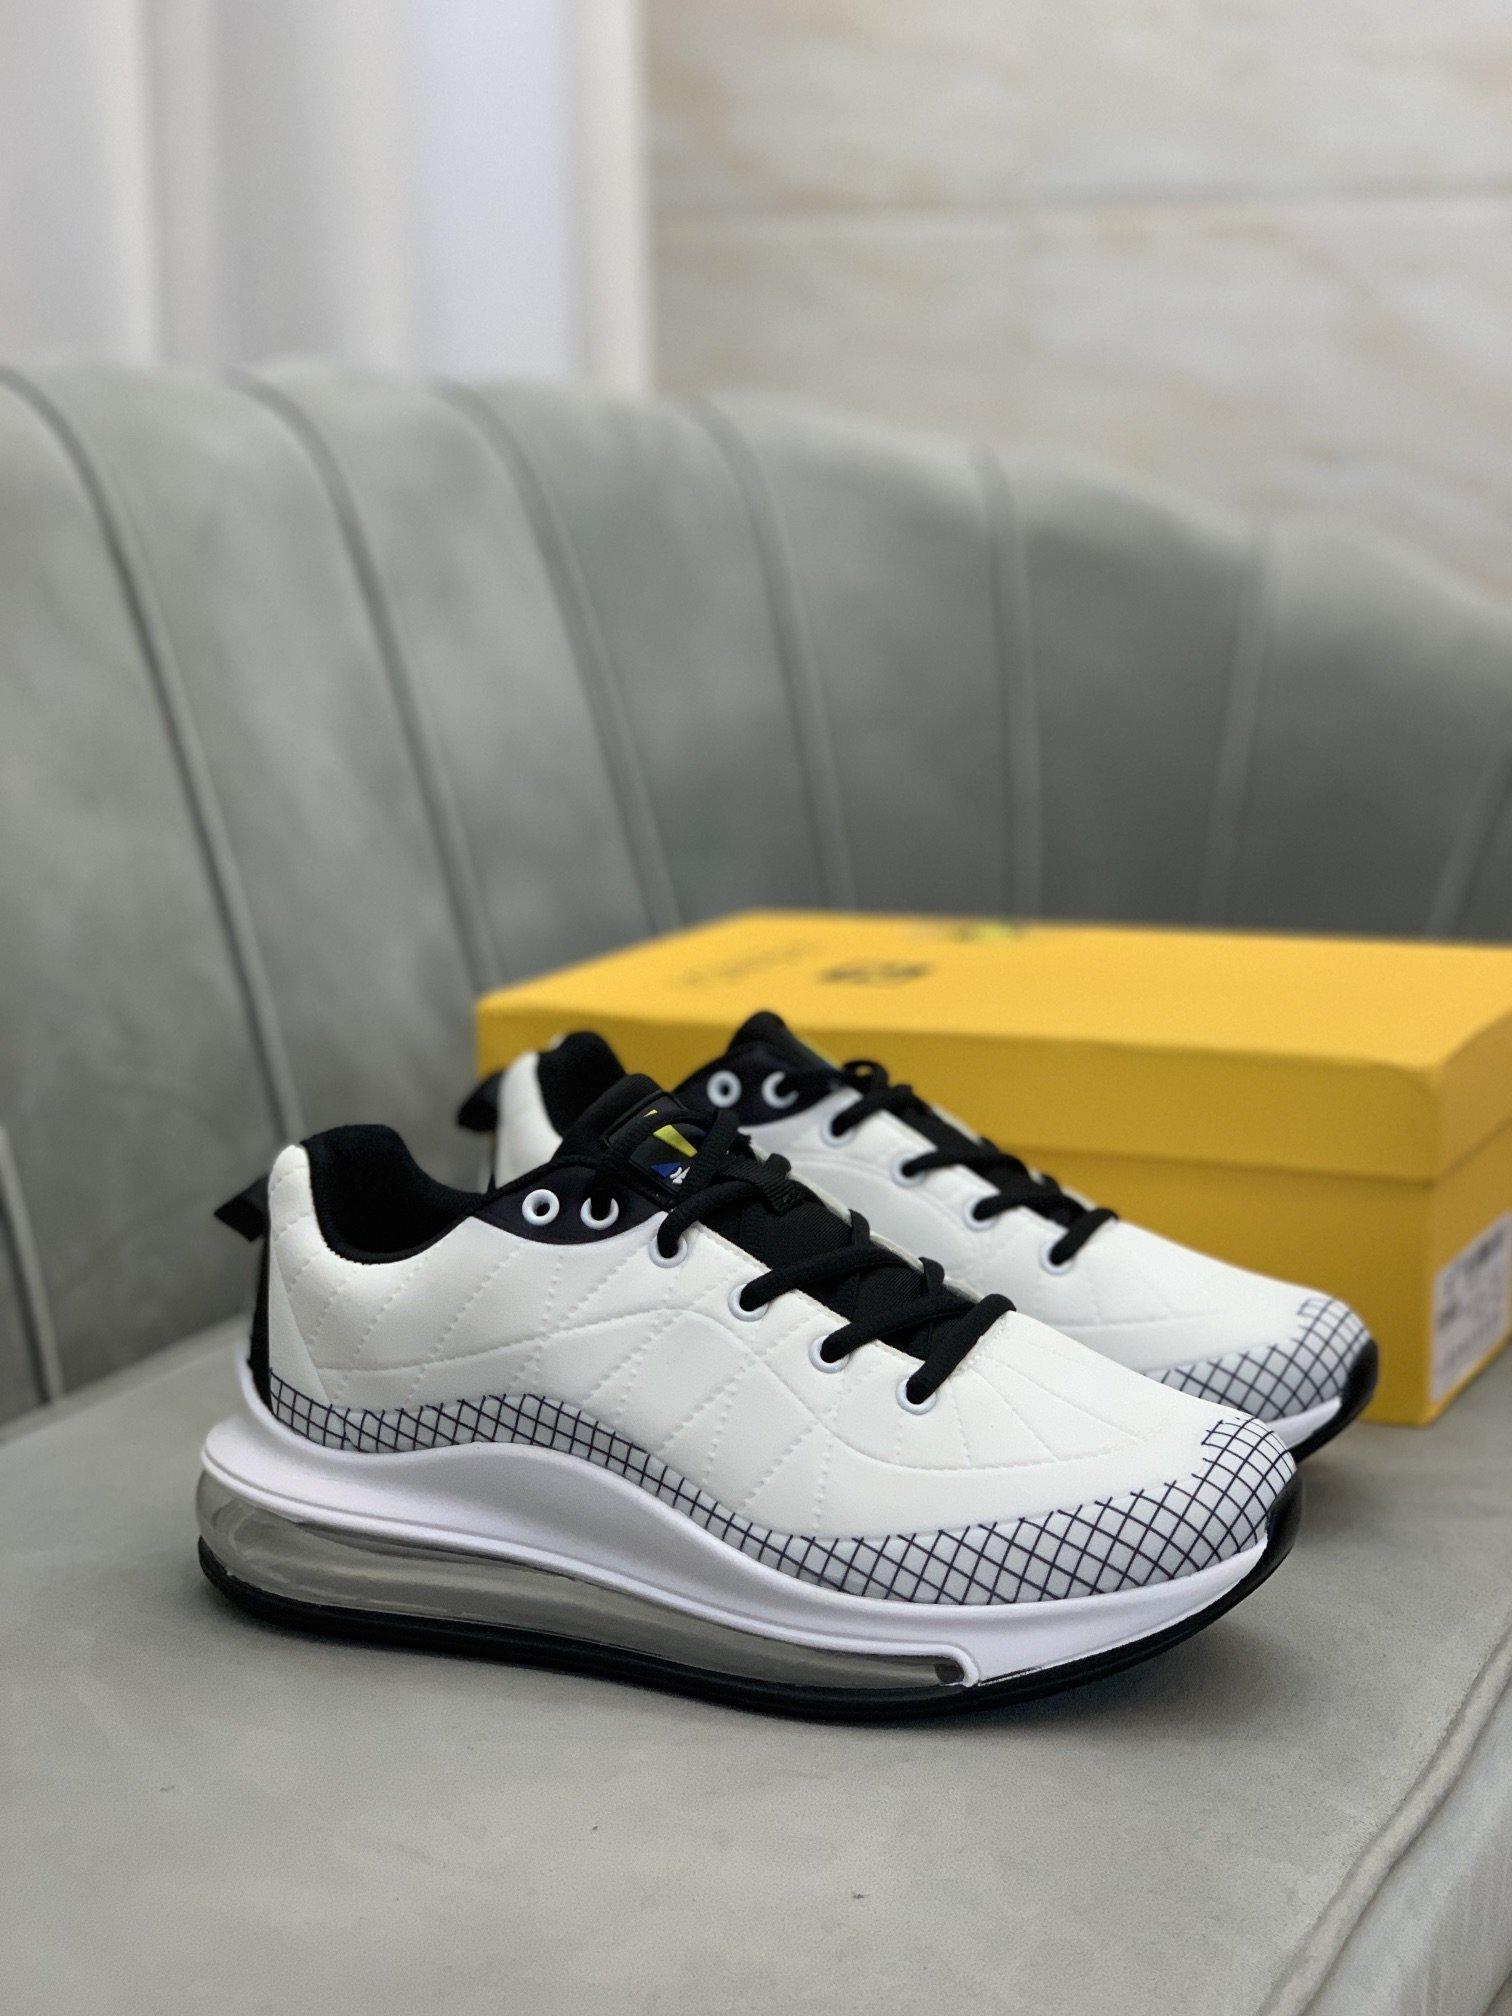 Fend*芬*低帮运动鞋正码码数:3